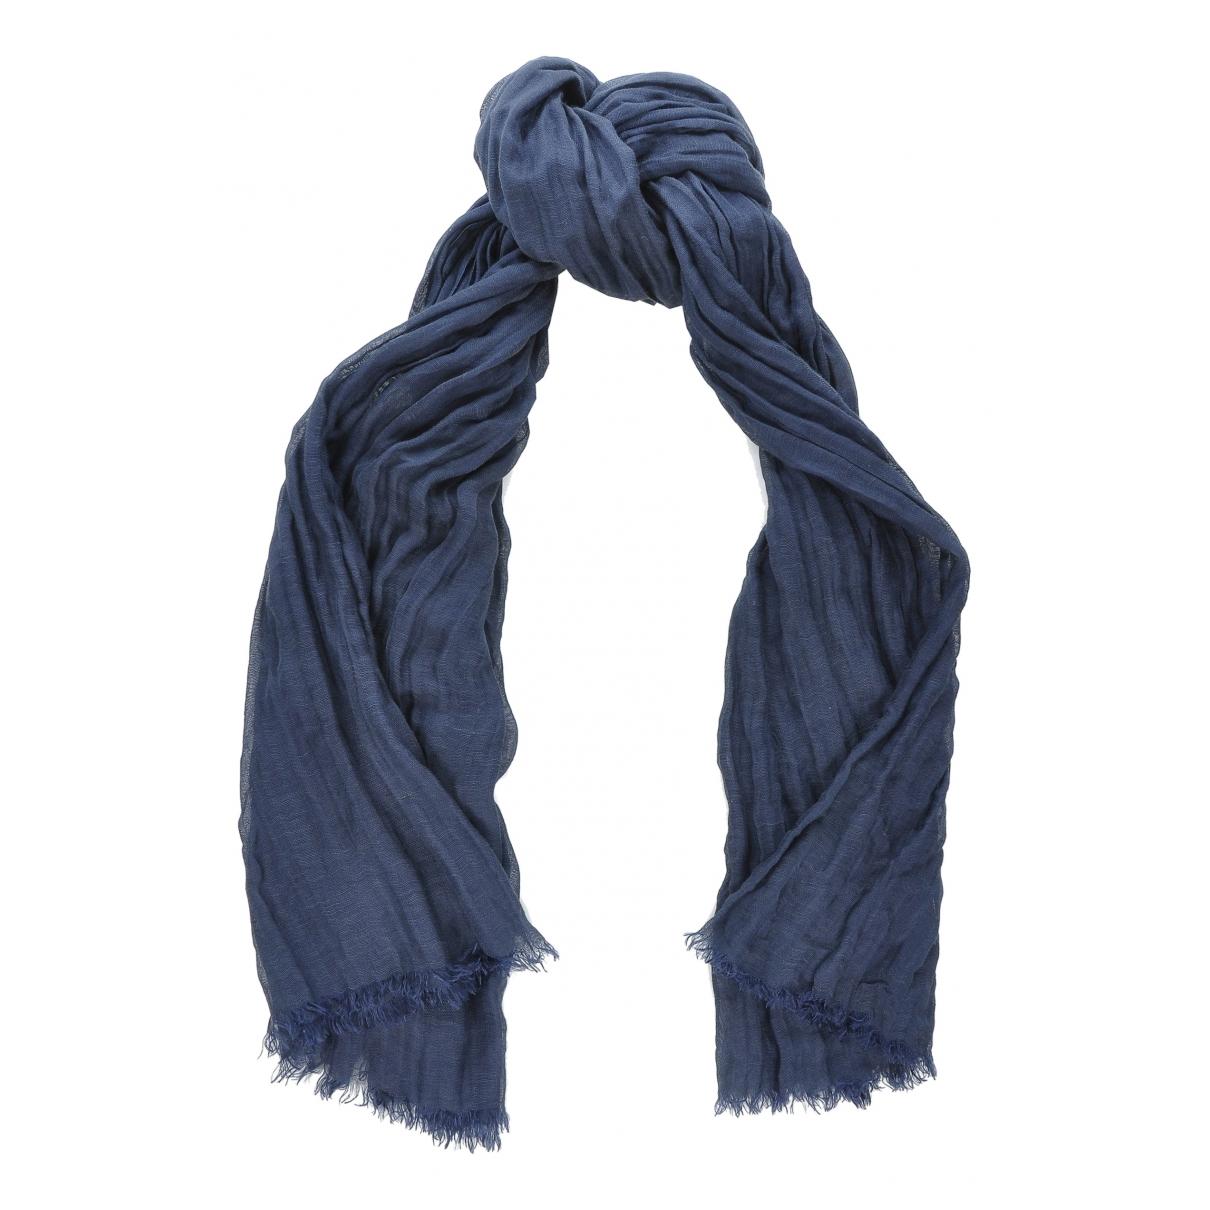 Max Mara 's \N Navy Linen scarf for Women \N